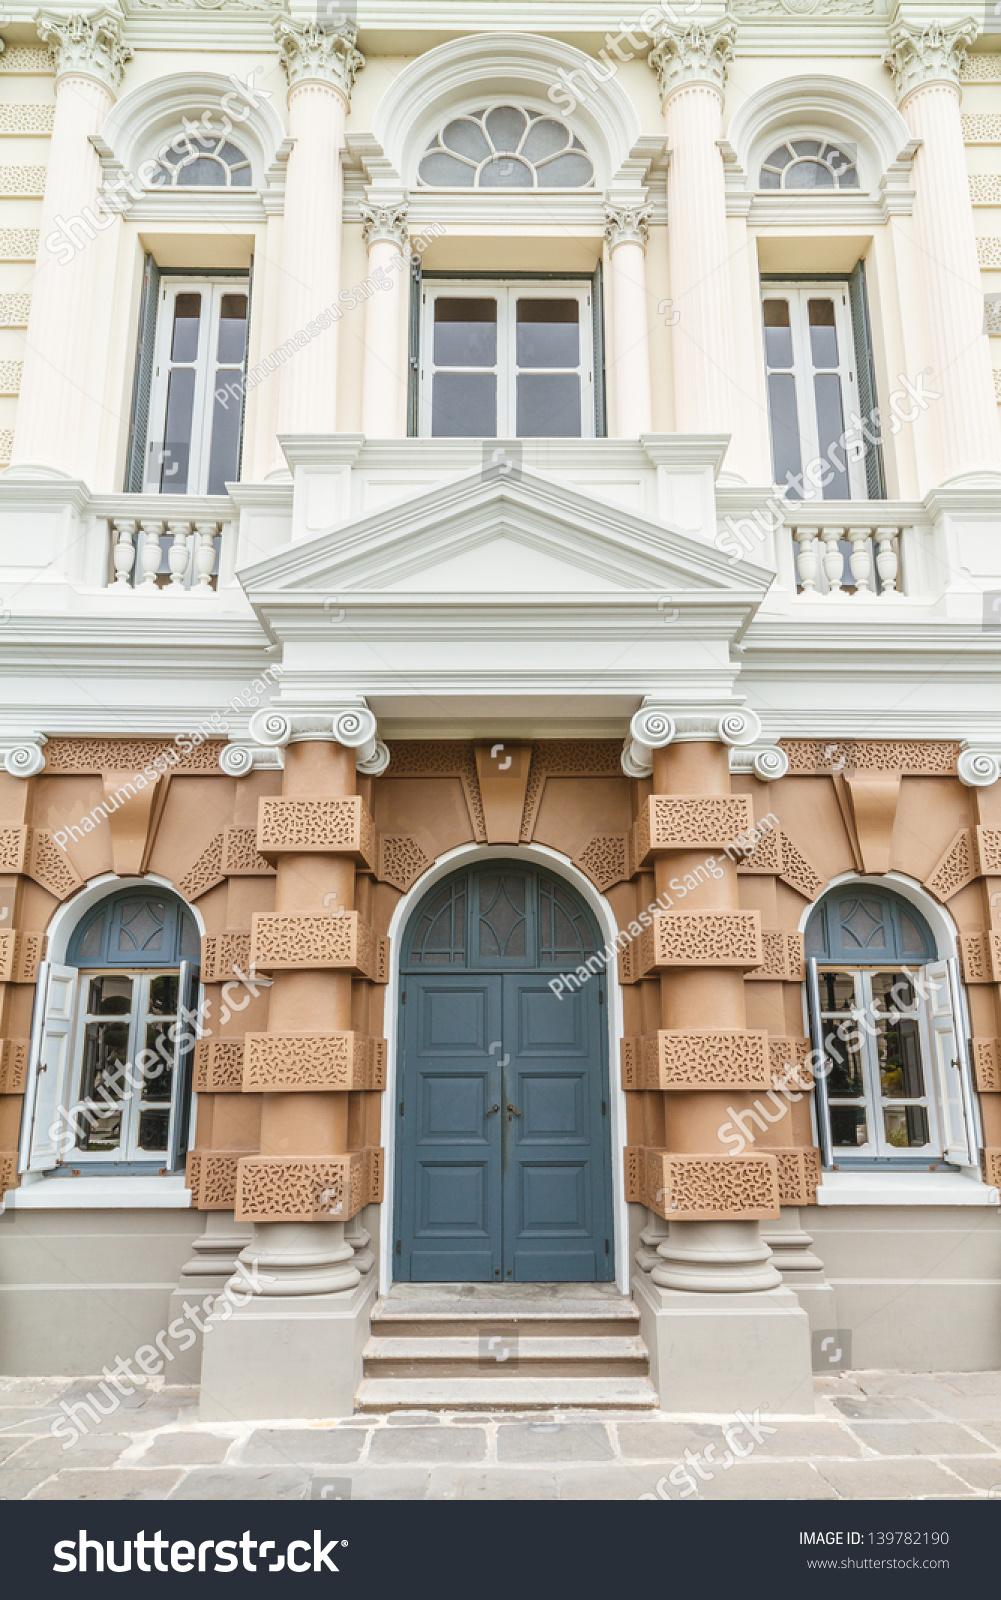 Door window european style grand palace stock photo for European style windows